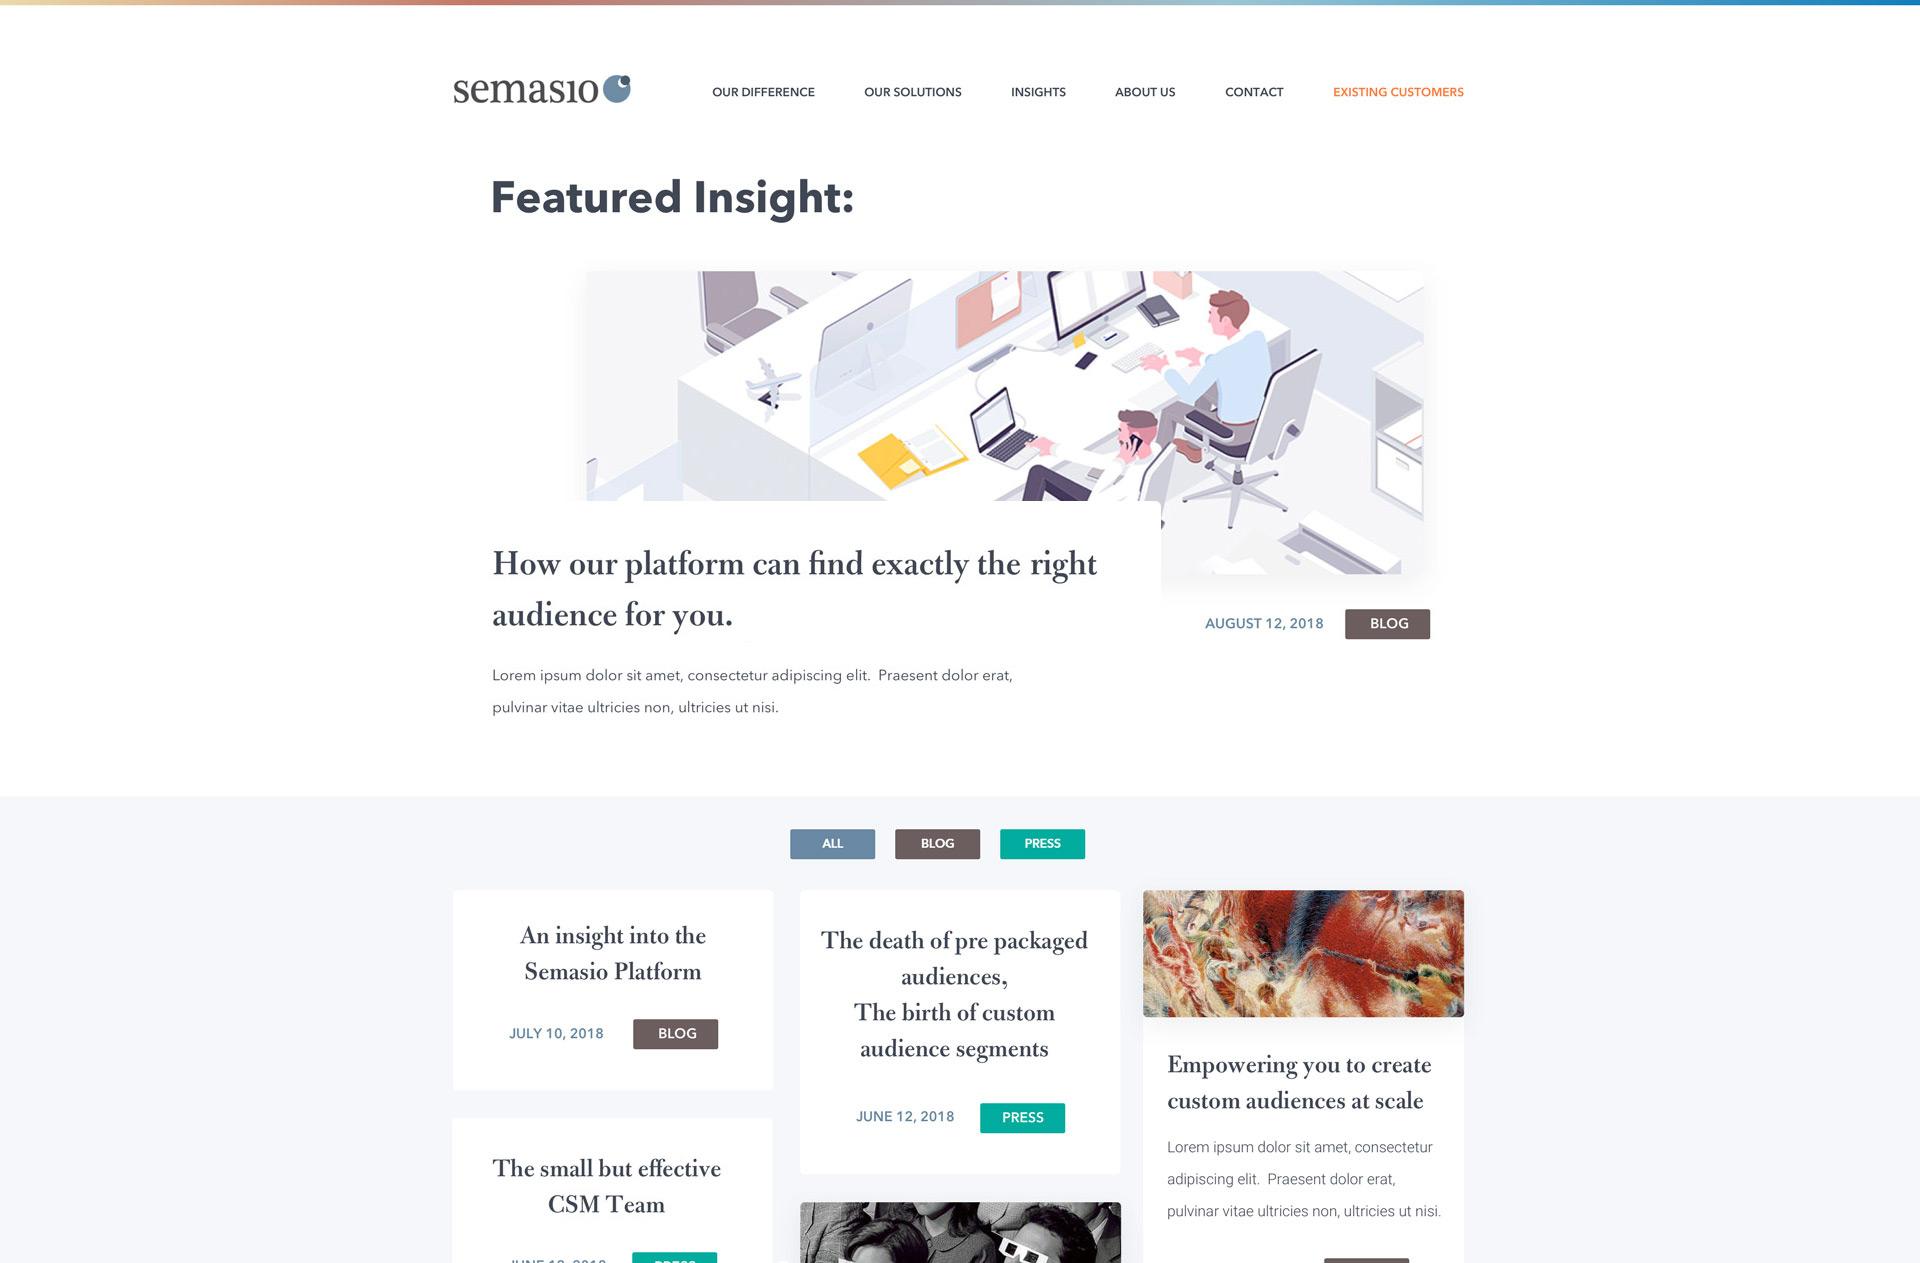 Semasio Blog